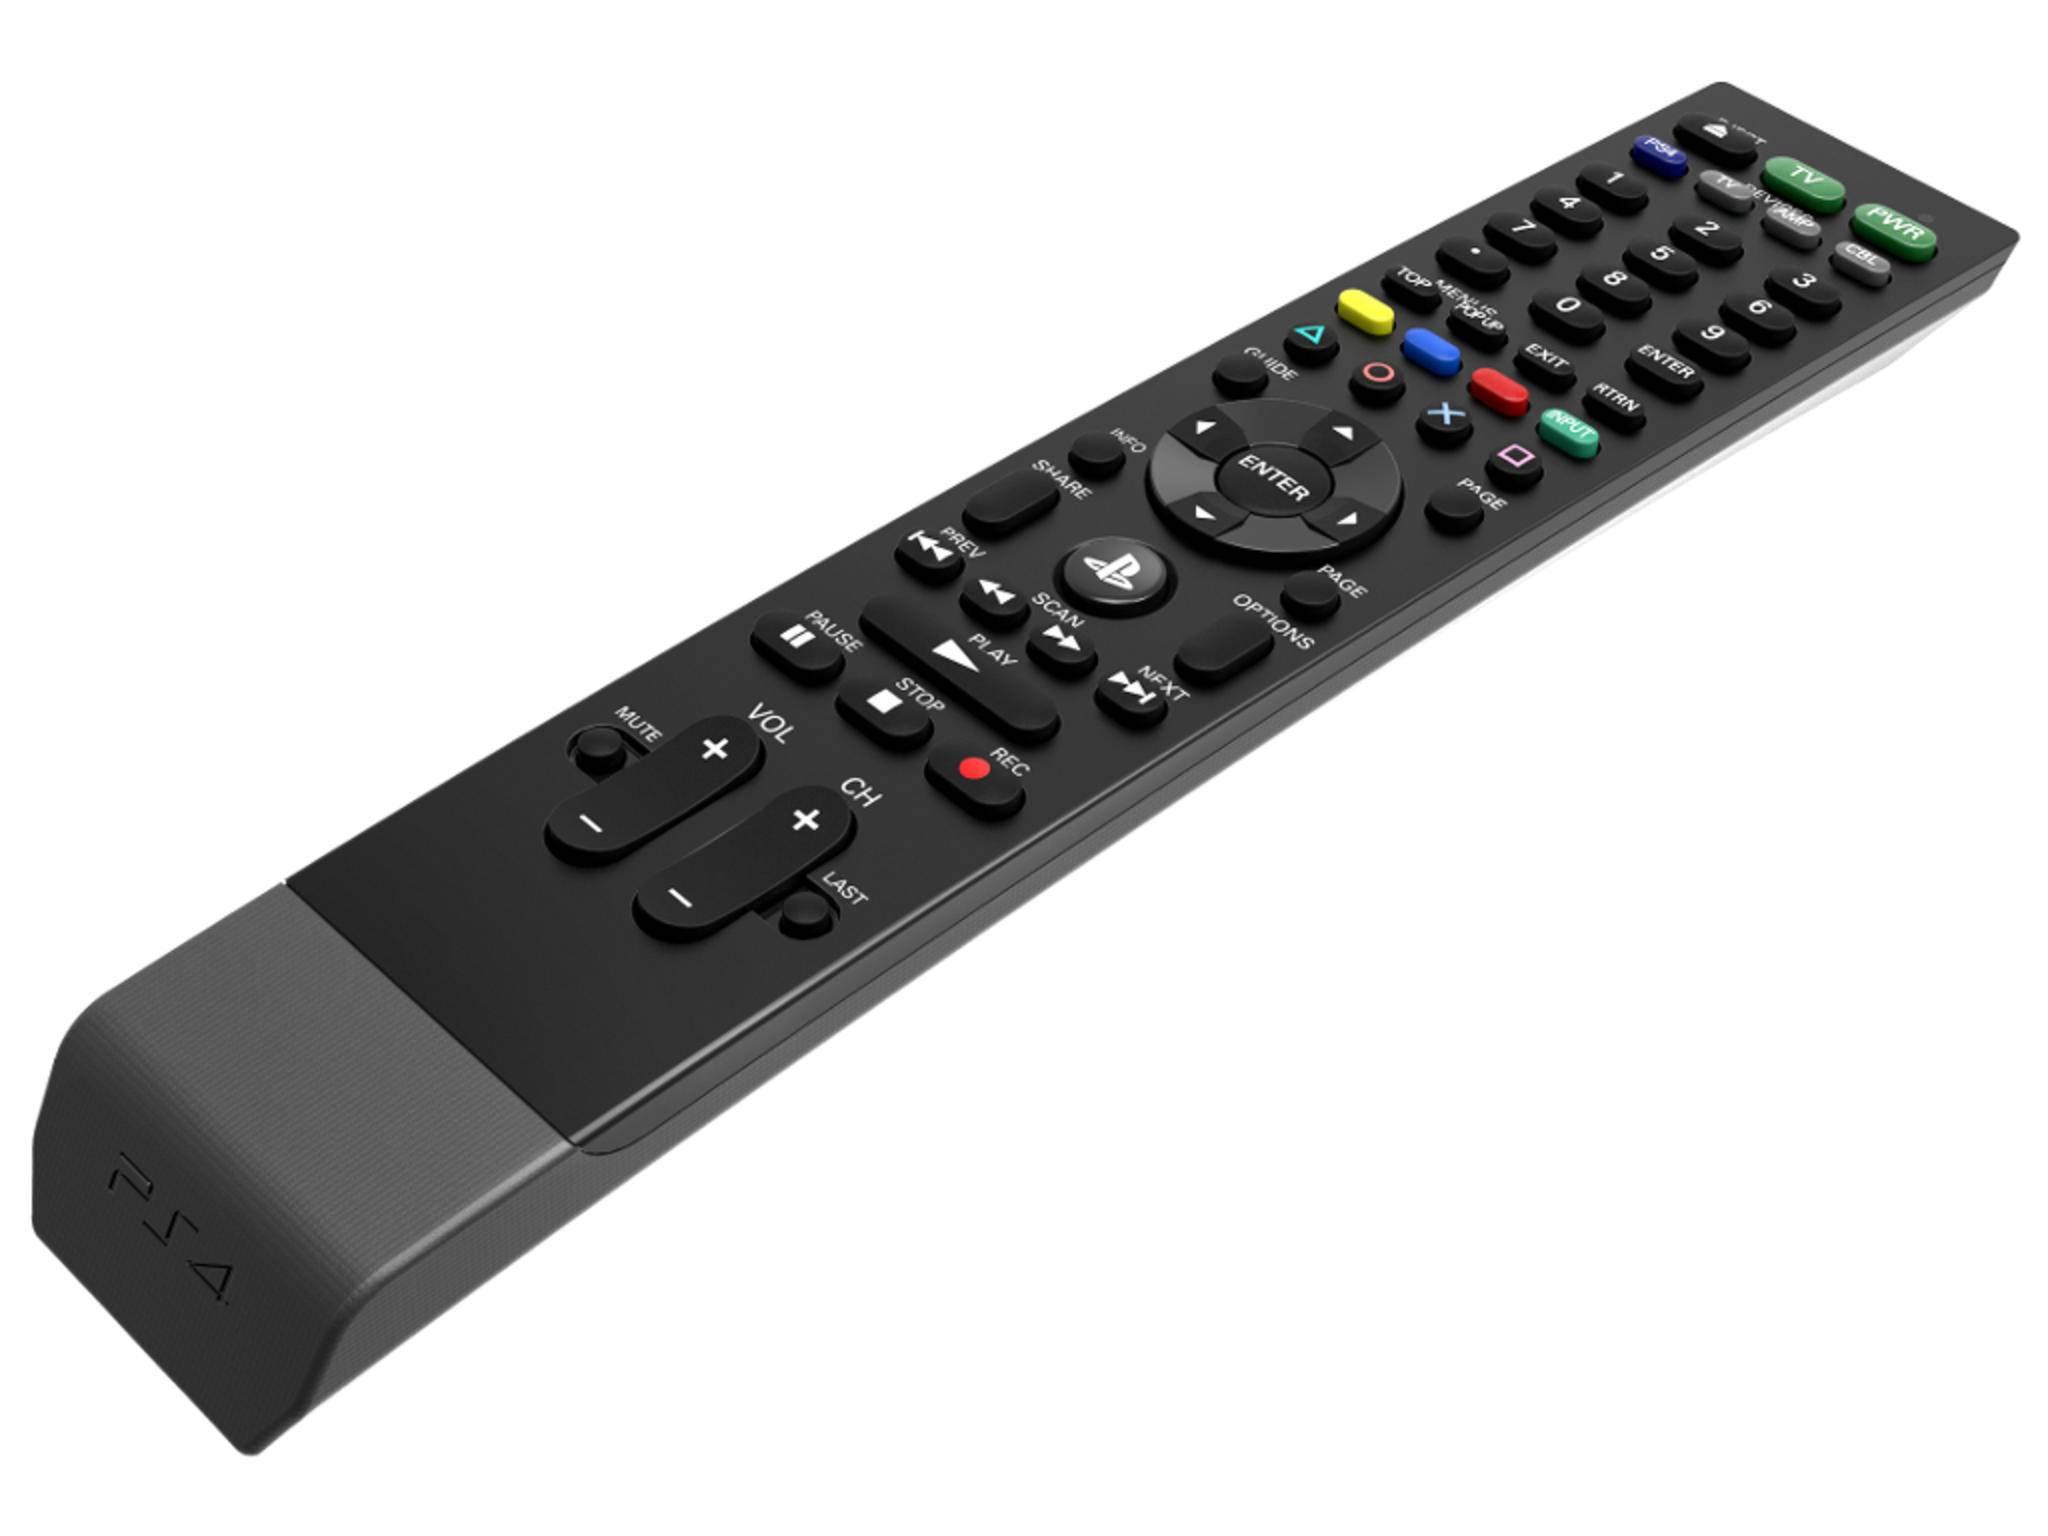 PS4 Universal Media Remote